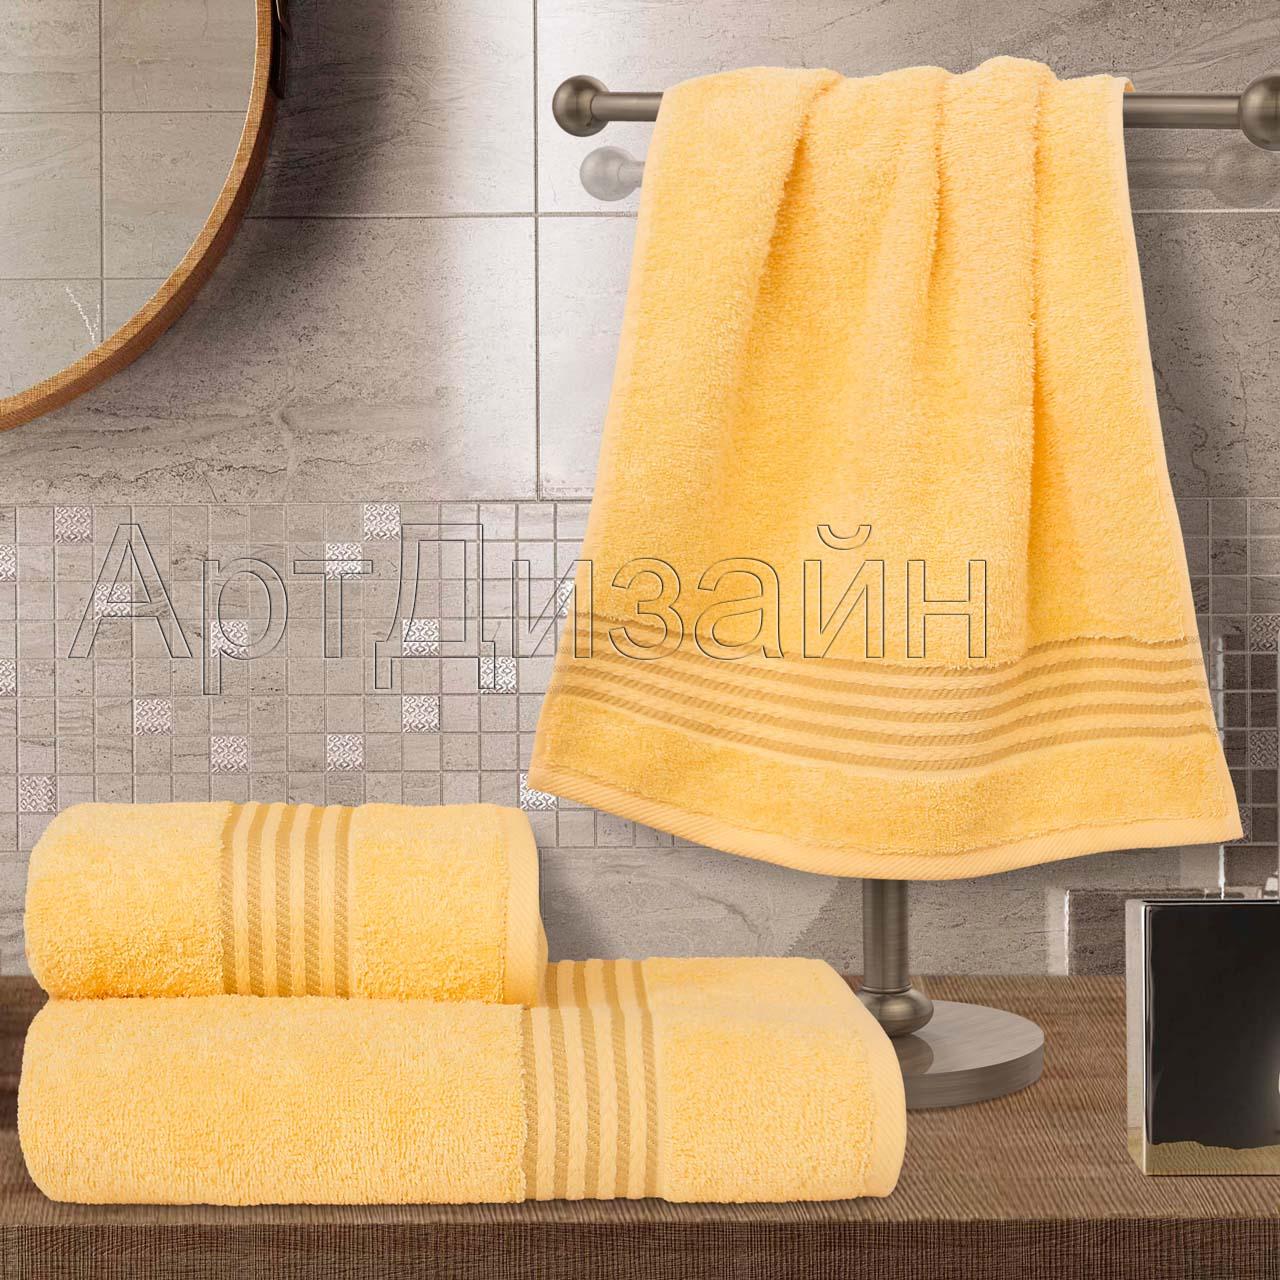 Полотенце Классик Светло-желтый р. 50х90Махровые полотенца<br>Плотность:400 г/кв. м<br><br>Тип: Полотенце<br>Размер: 50х90<br>Материал: Махра